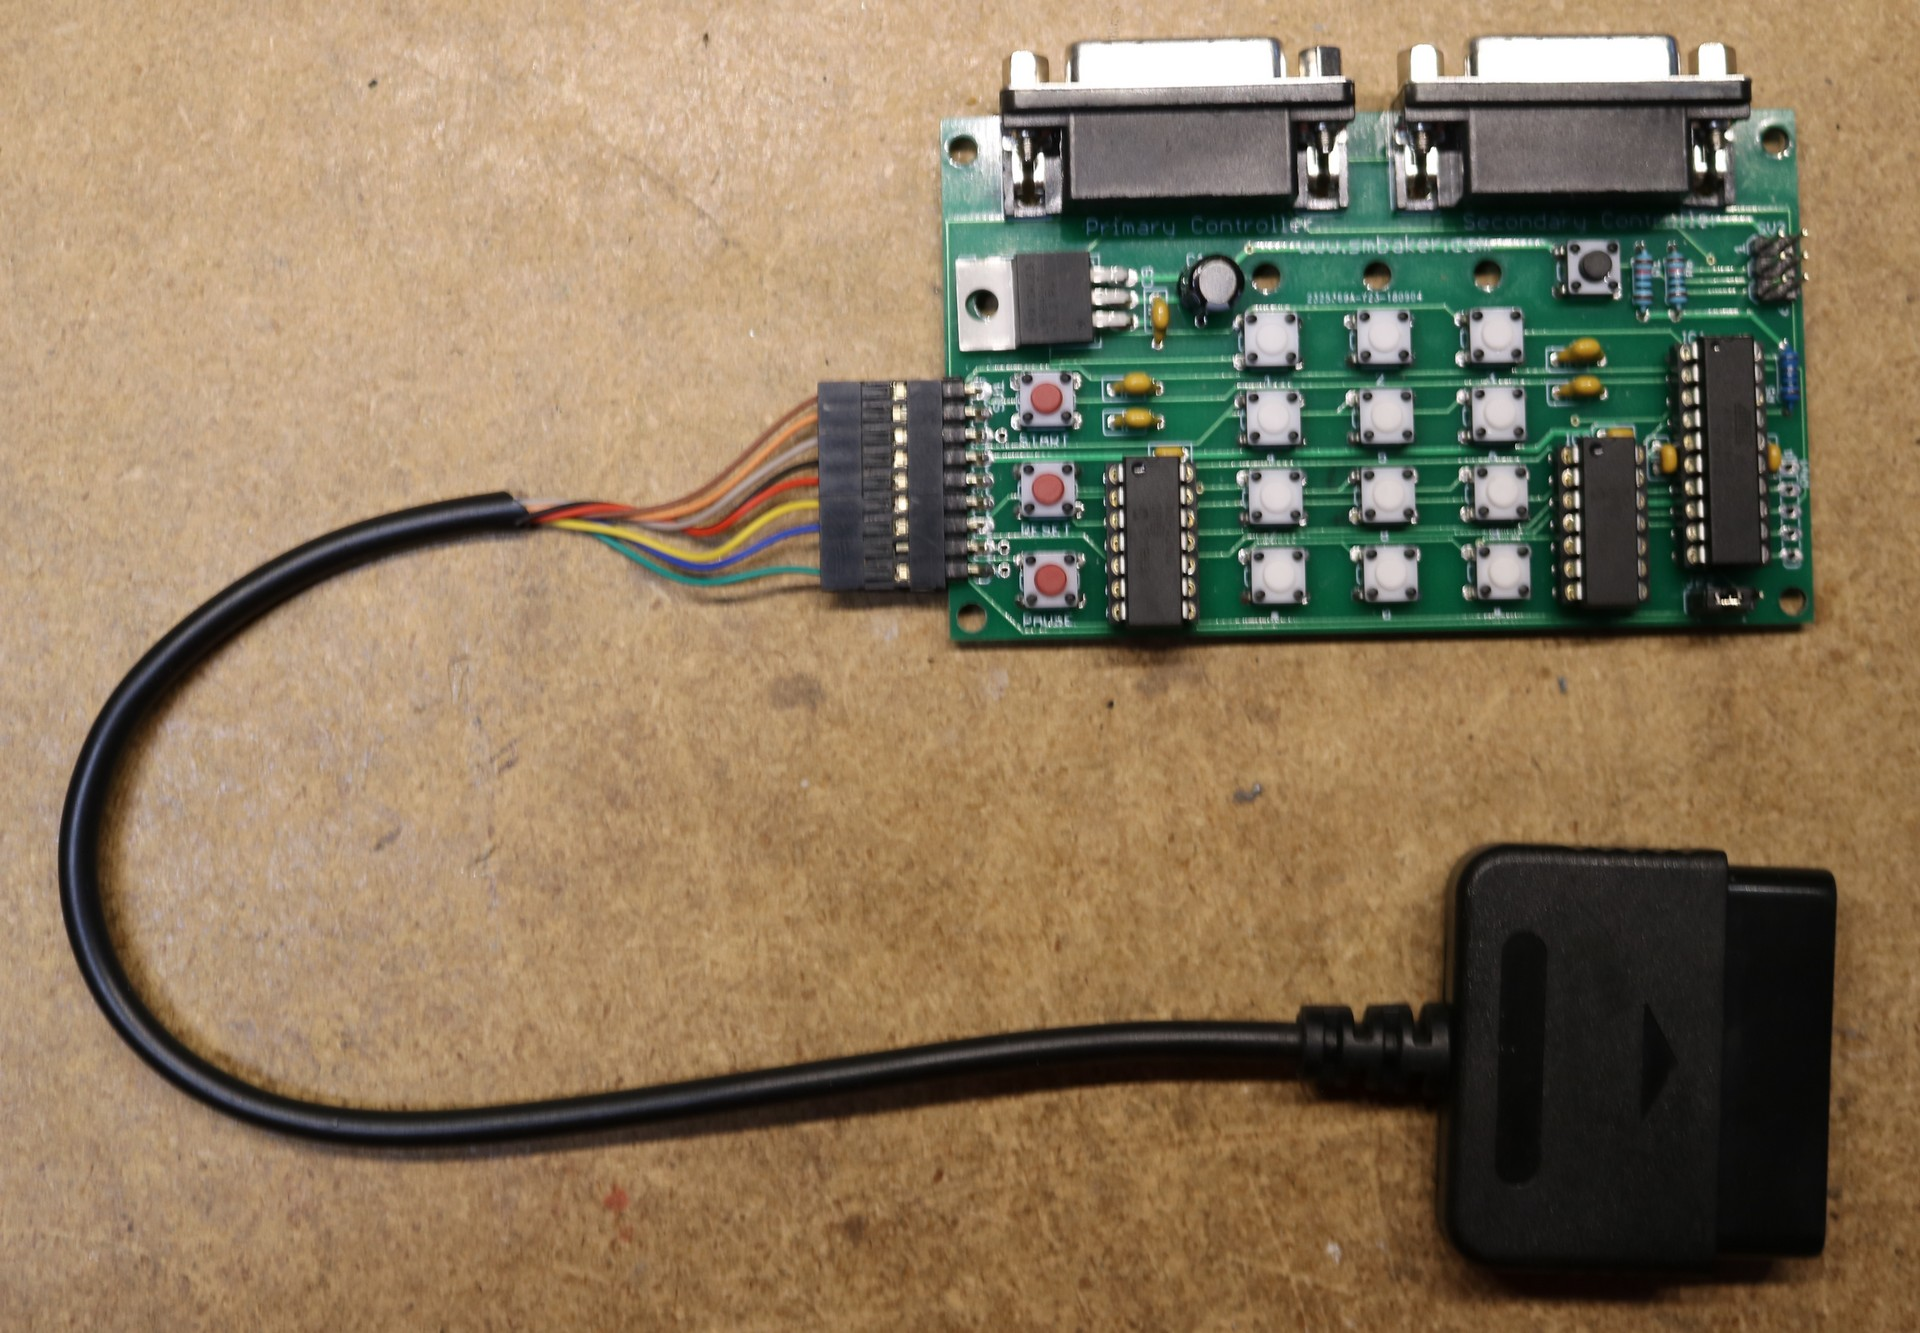 Atari 5200 Playstation 2 Dual Shock Controller Adapter Dr Scott M Ps2 Power Schematic Assembled